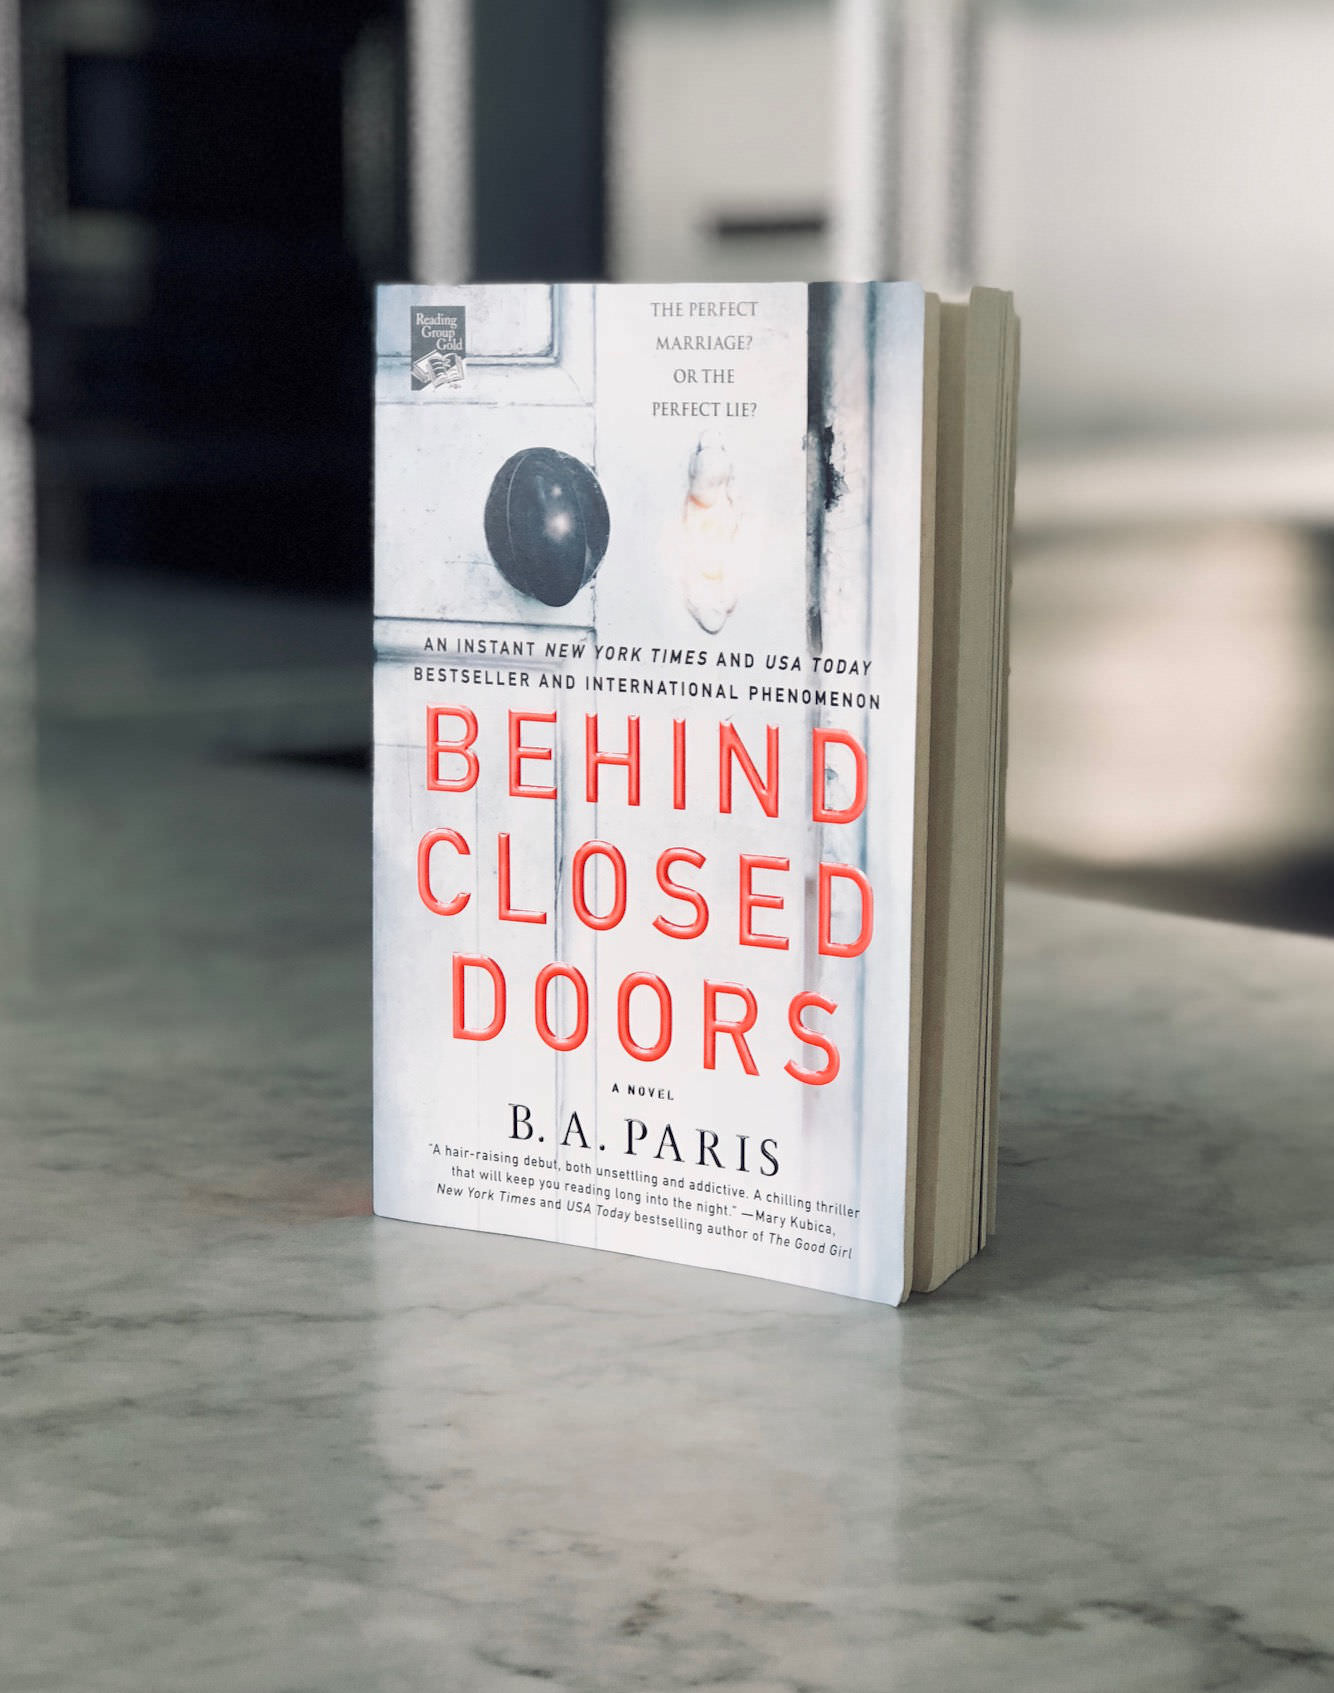 behind closed doors review-compressed.jpeg